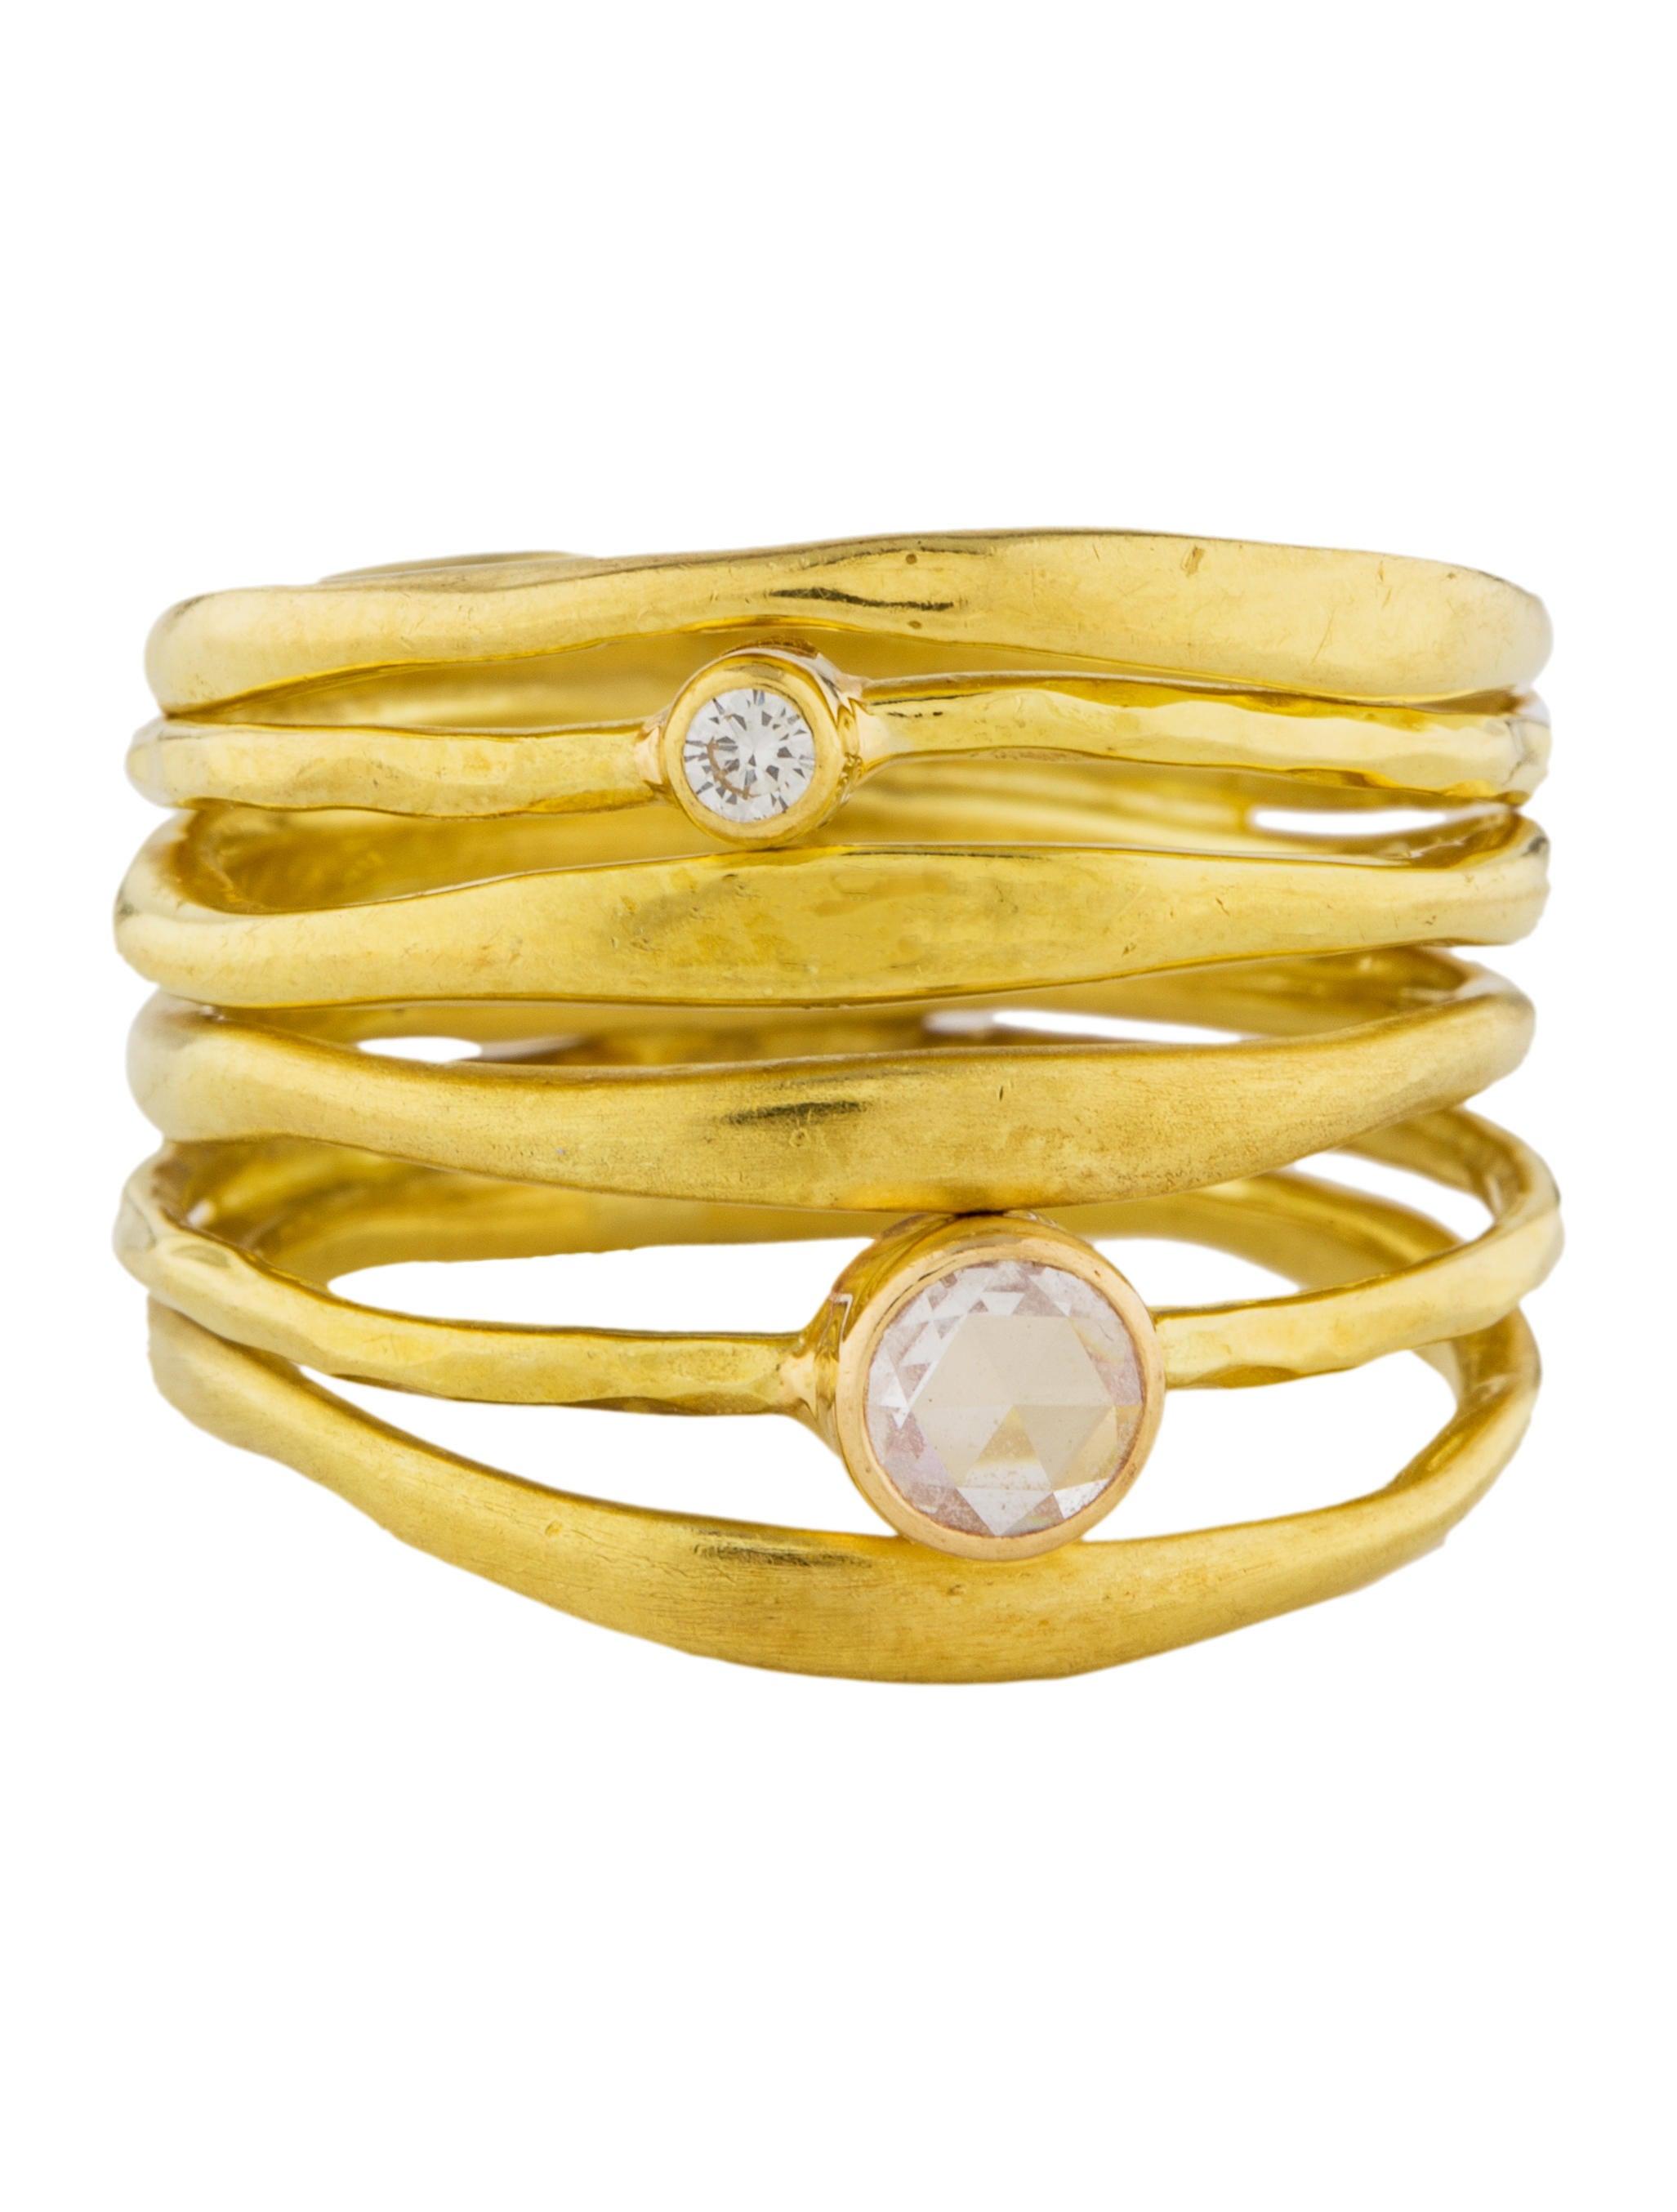 Ippolita Diamond Movie Star Sixband Ring  Rings. Pear Shaped Diamond Rings. Rough Black Diamond Wedding Rings. Nose Wedding Rings. Top View Engagement Rings. Legal Wedding Rings. Pine Tree Wedding Rings. Peach Wedding Rings. Countdown Engagement Rings